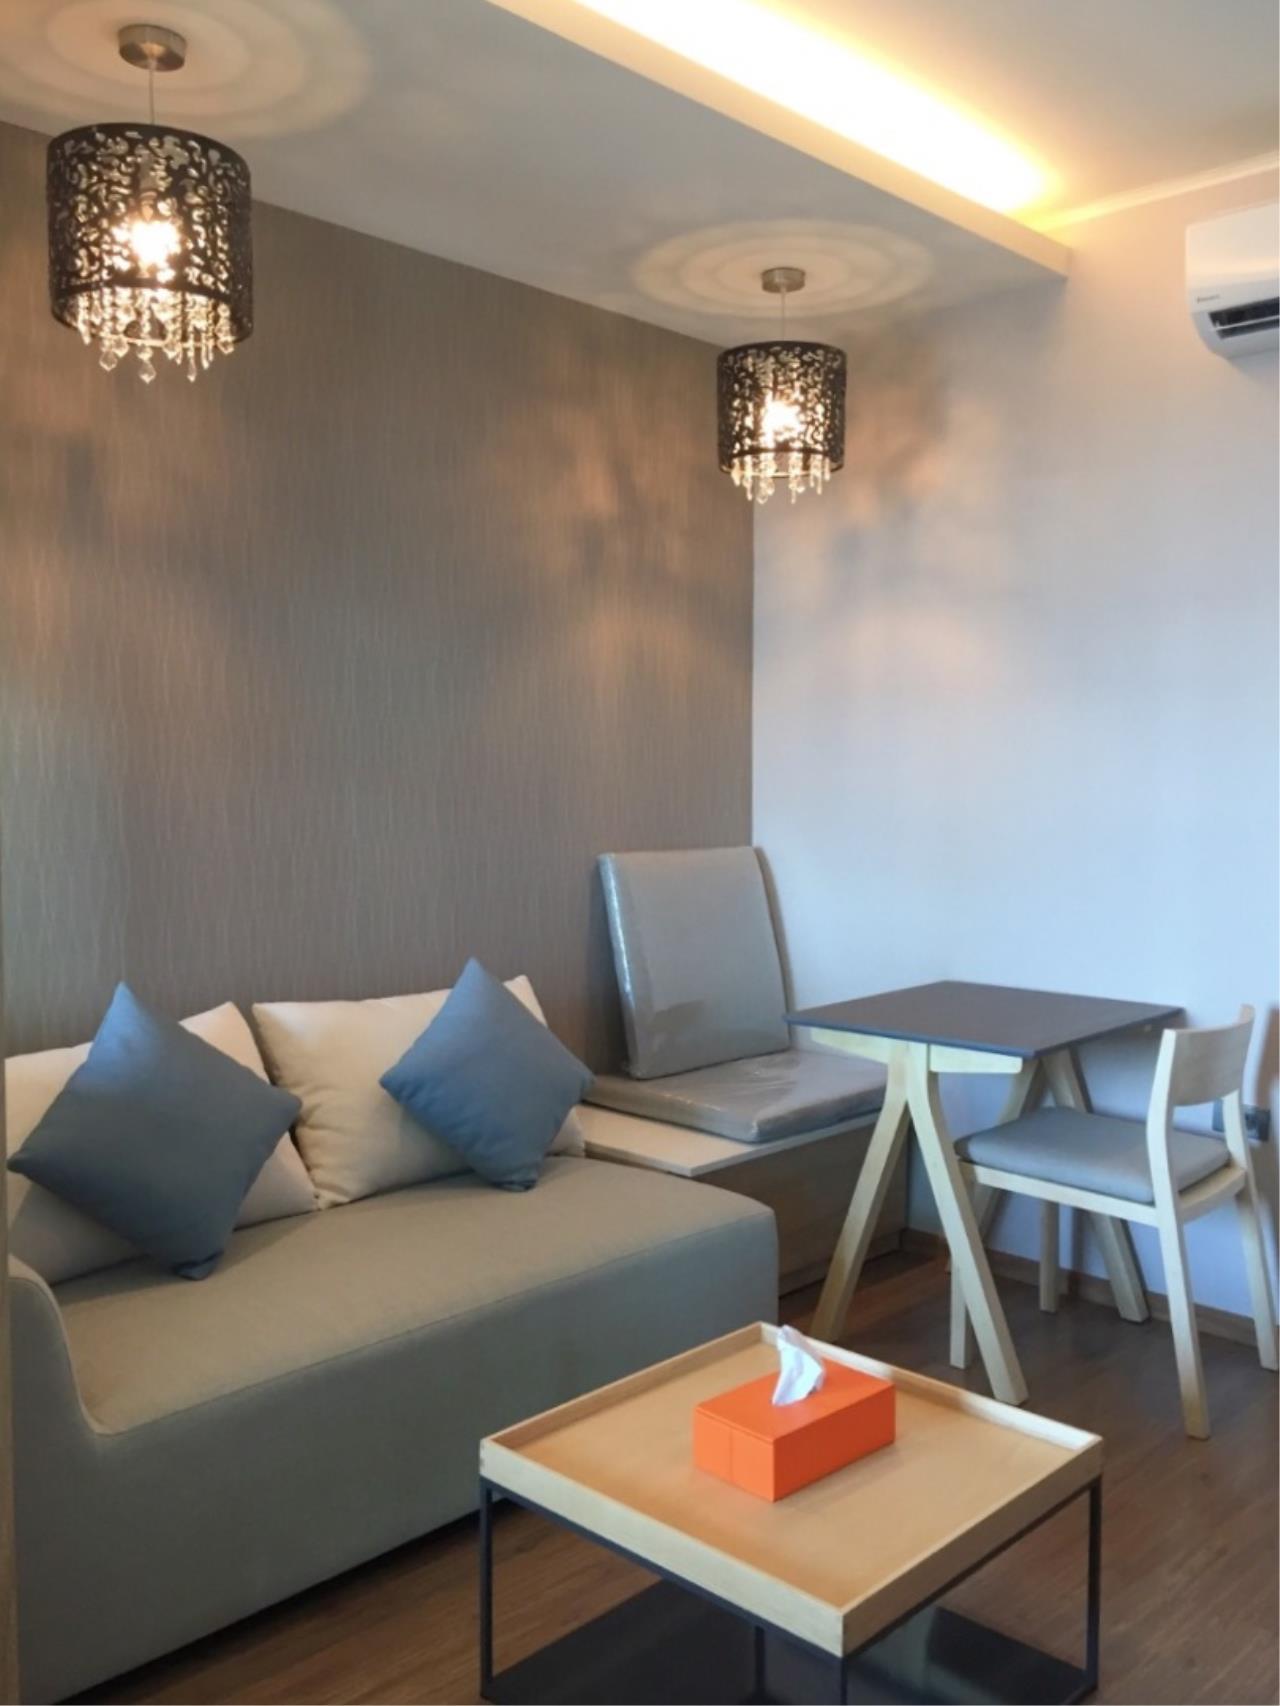 Century21 Skylux Agency's U Delight Residence Riverfront Rama 3 / Condo For Sale / 1 Bedroom / 35 SQM / BTS Saphan Taksin / Bangkok 2